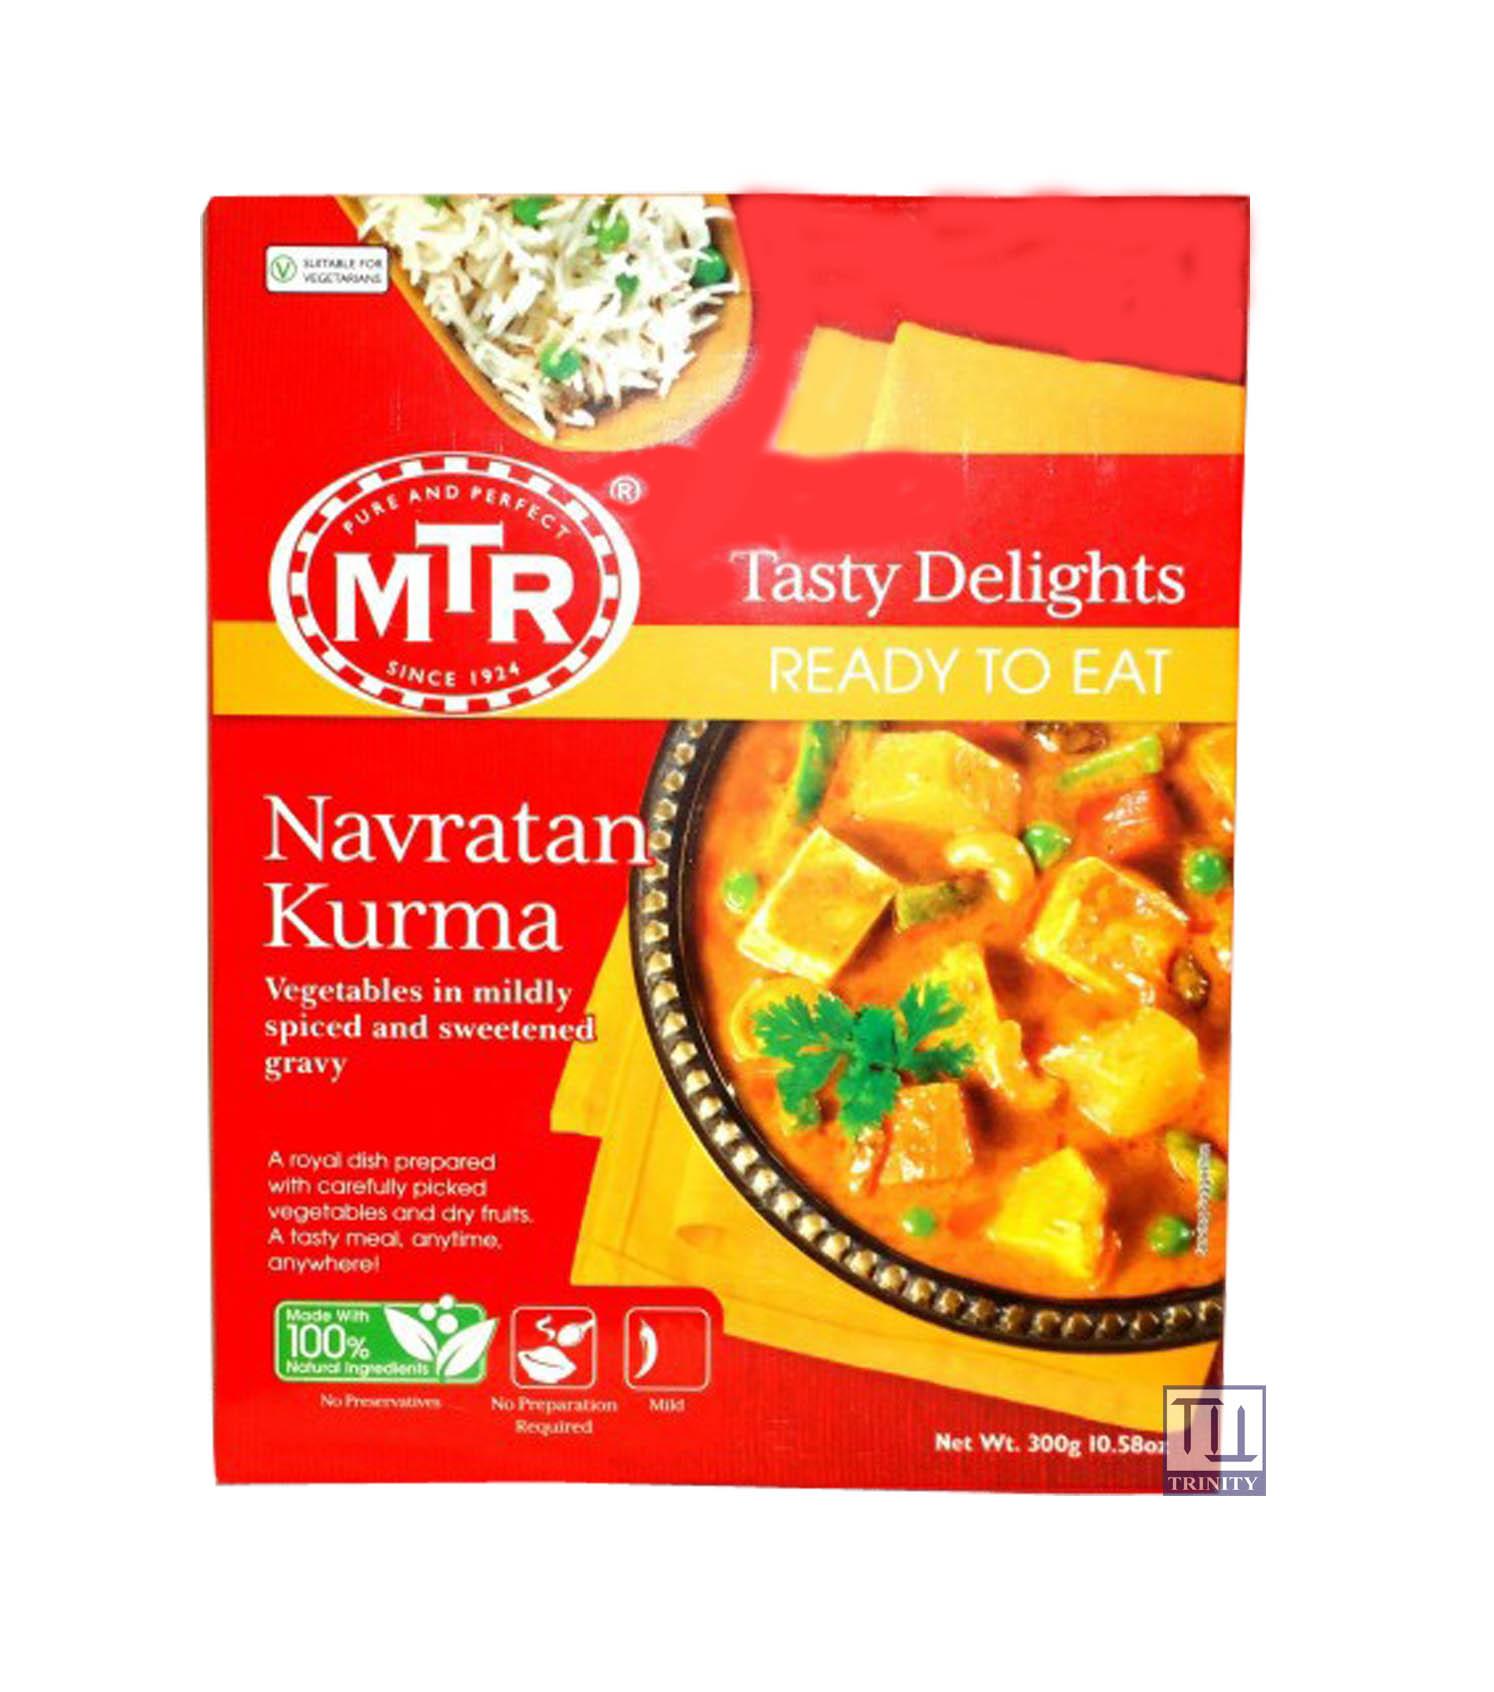 Mtr Navarathan Kurma 印度蔬菜堅果即食調理包